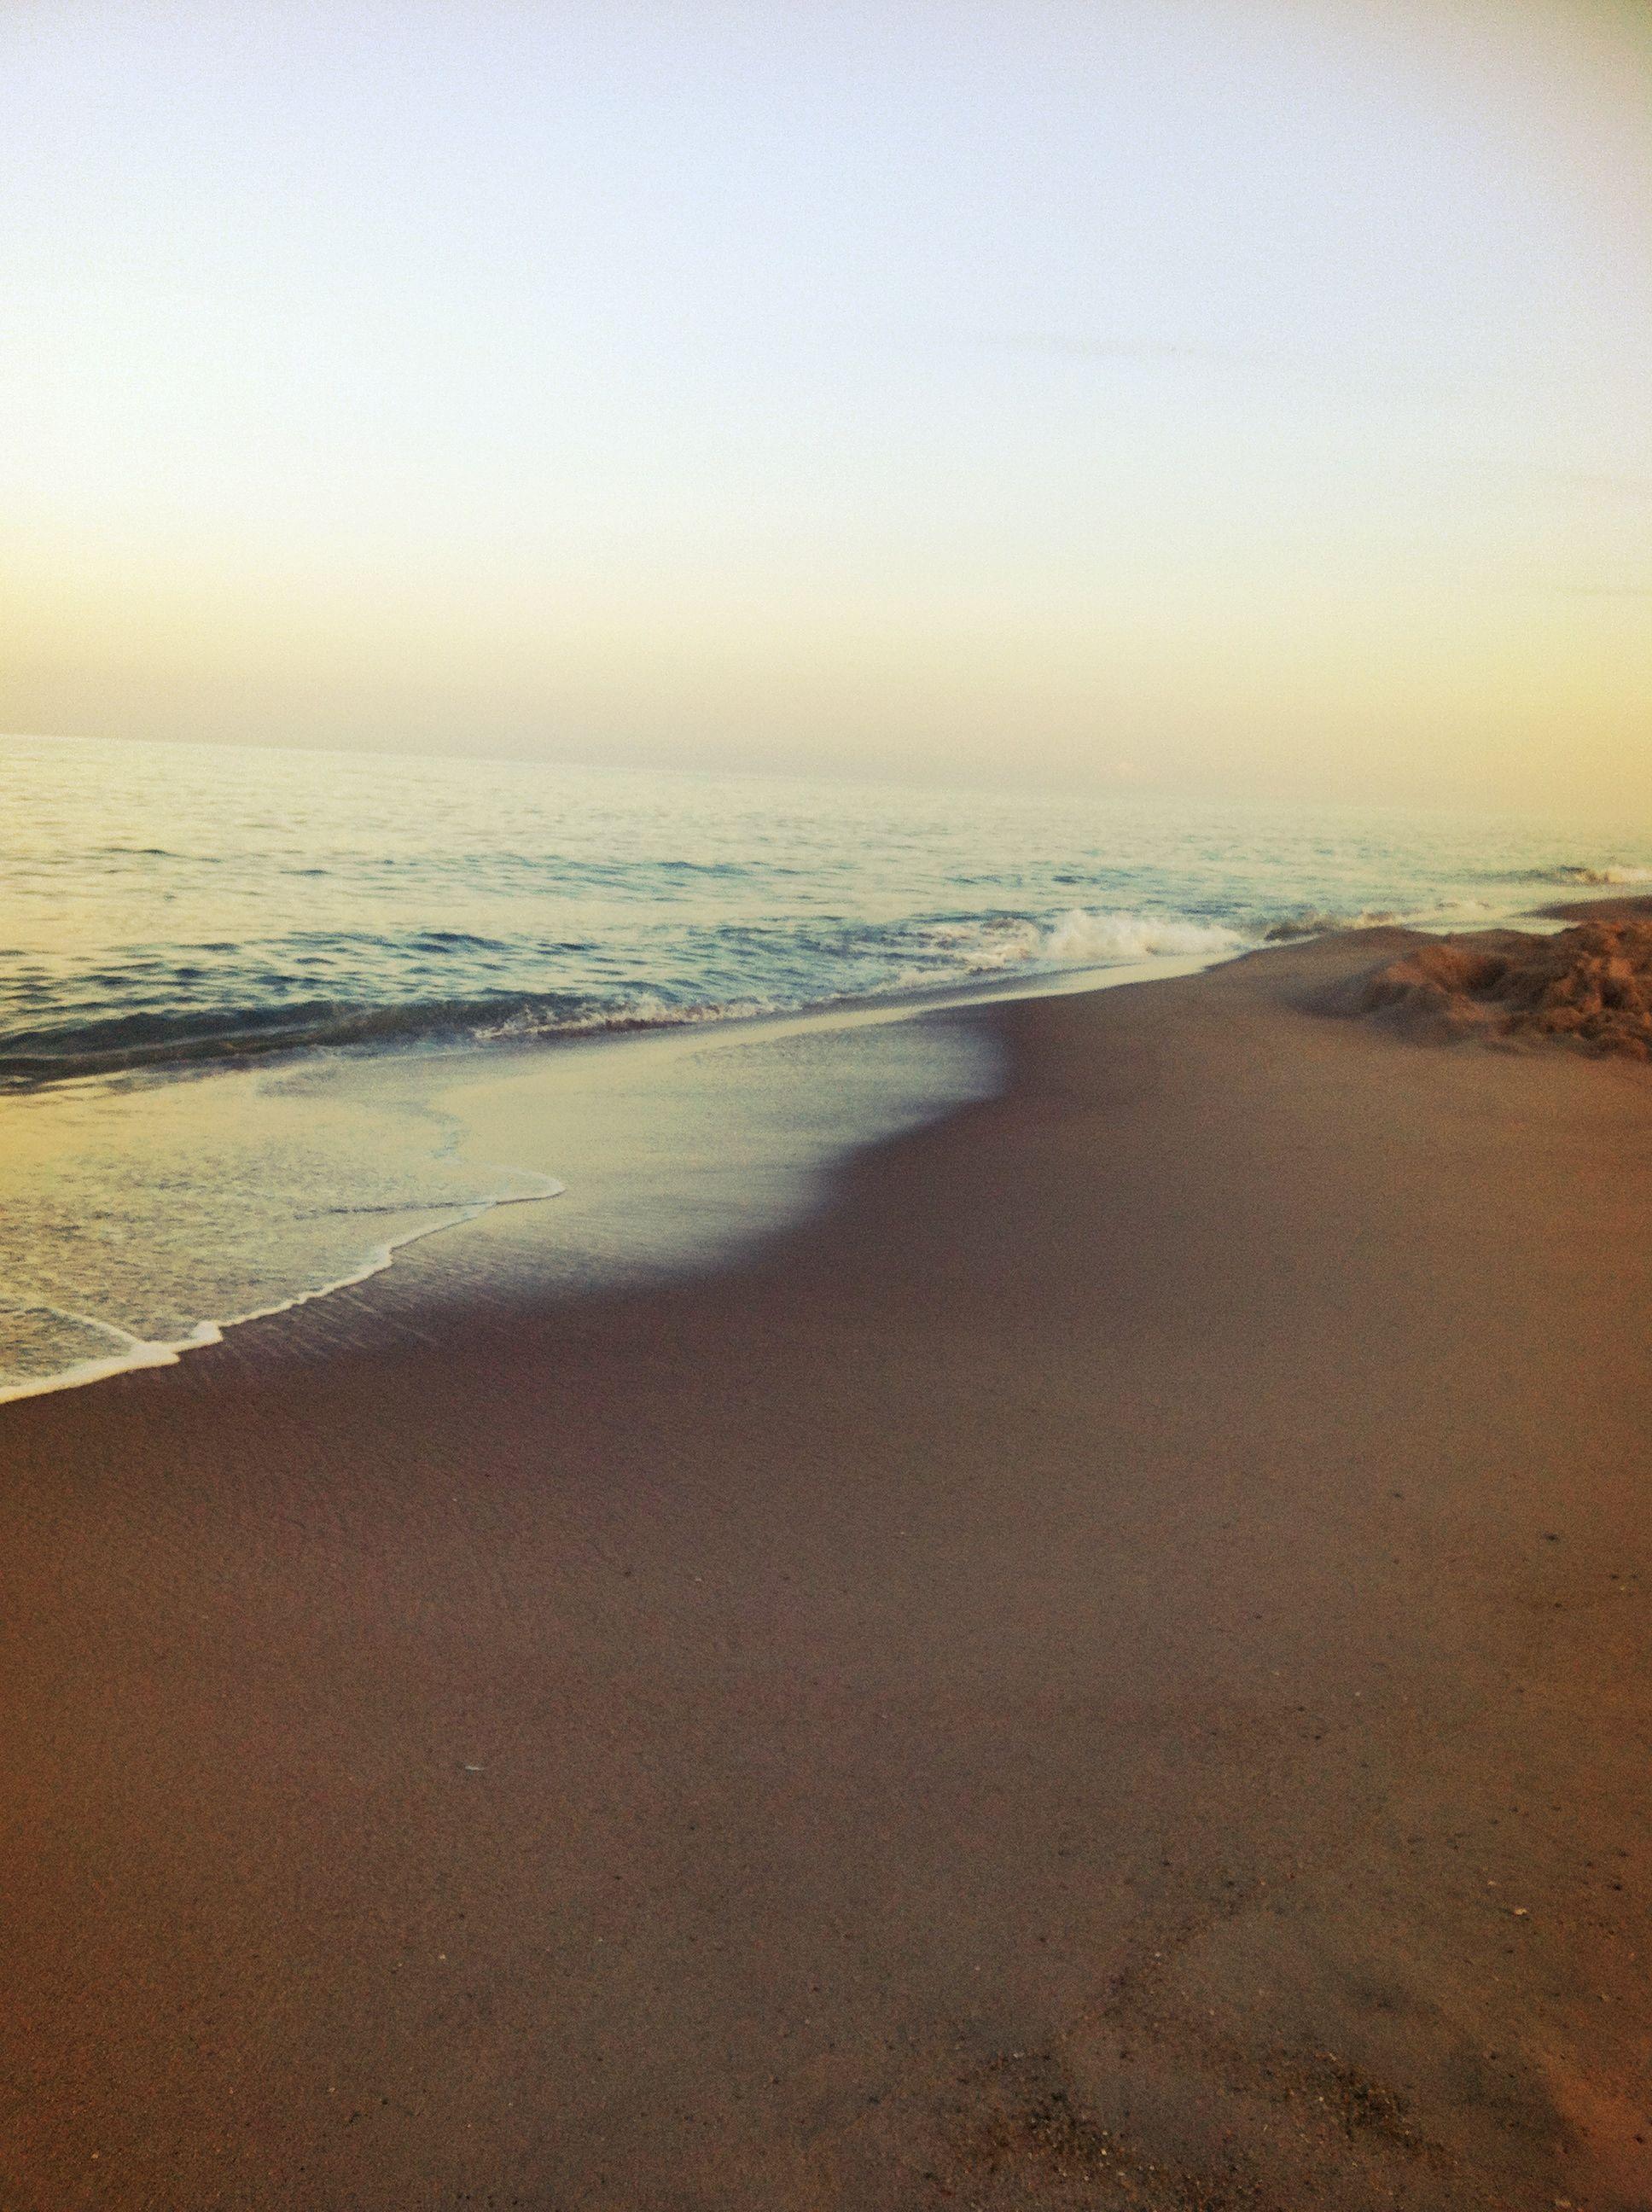 Rehoboth Beach Delaware httpvacationtraveloguecom Guaranteed Best